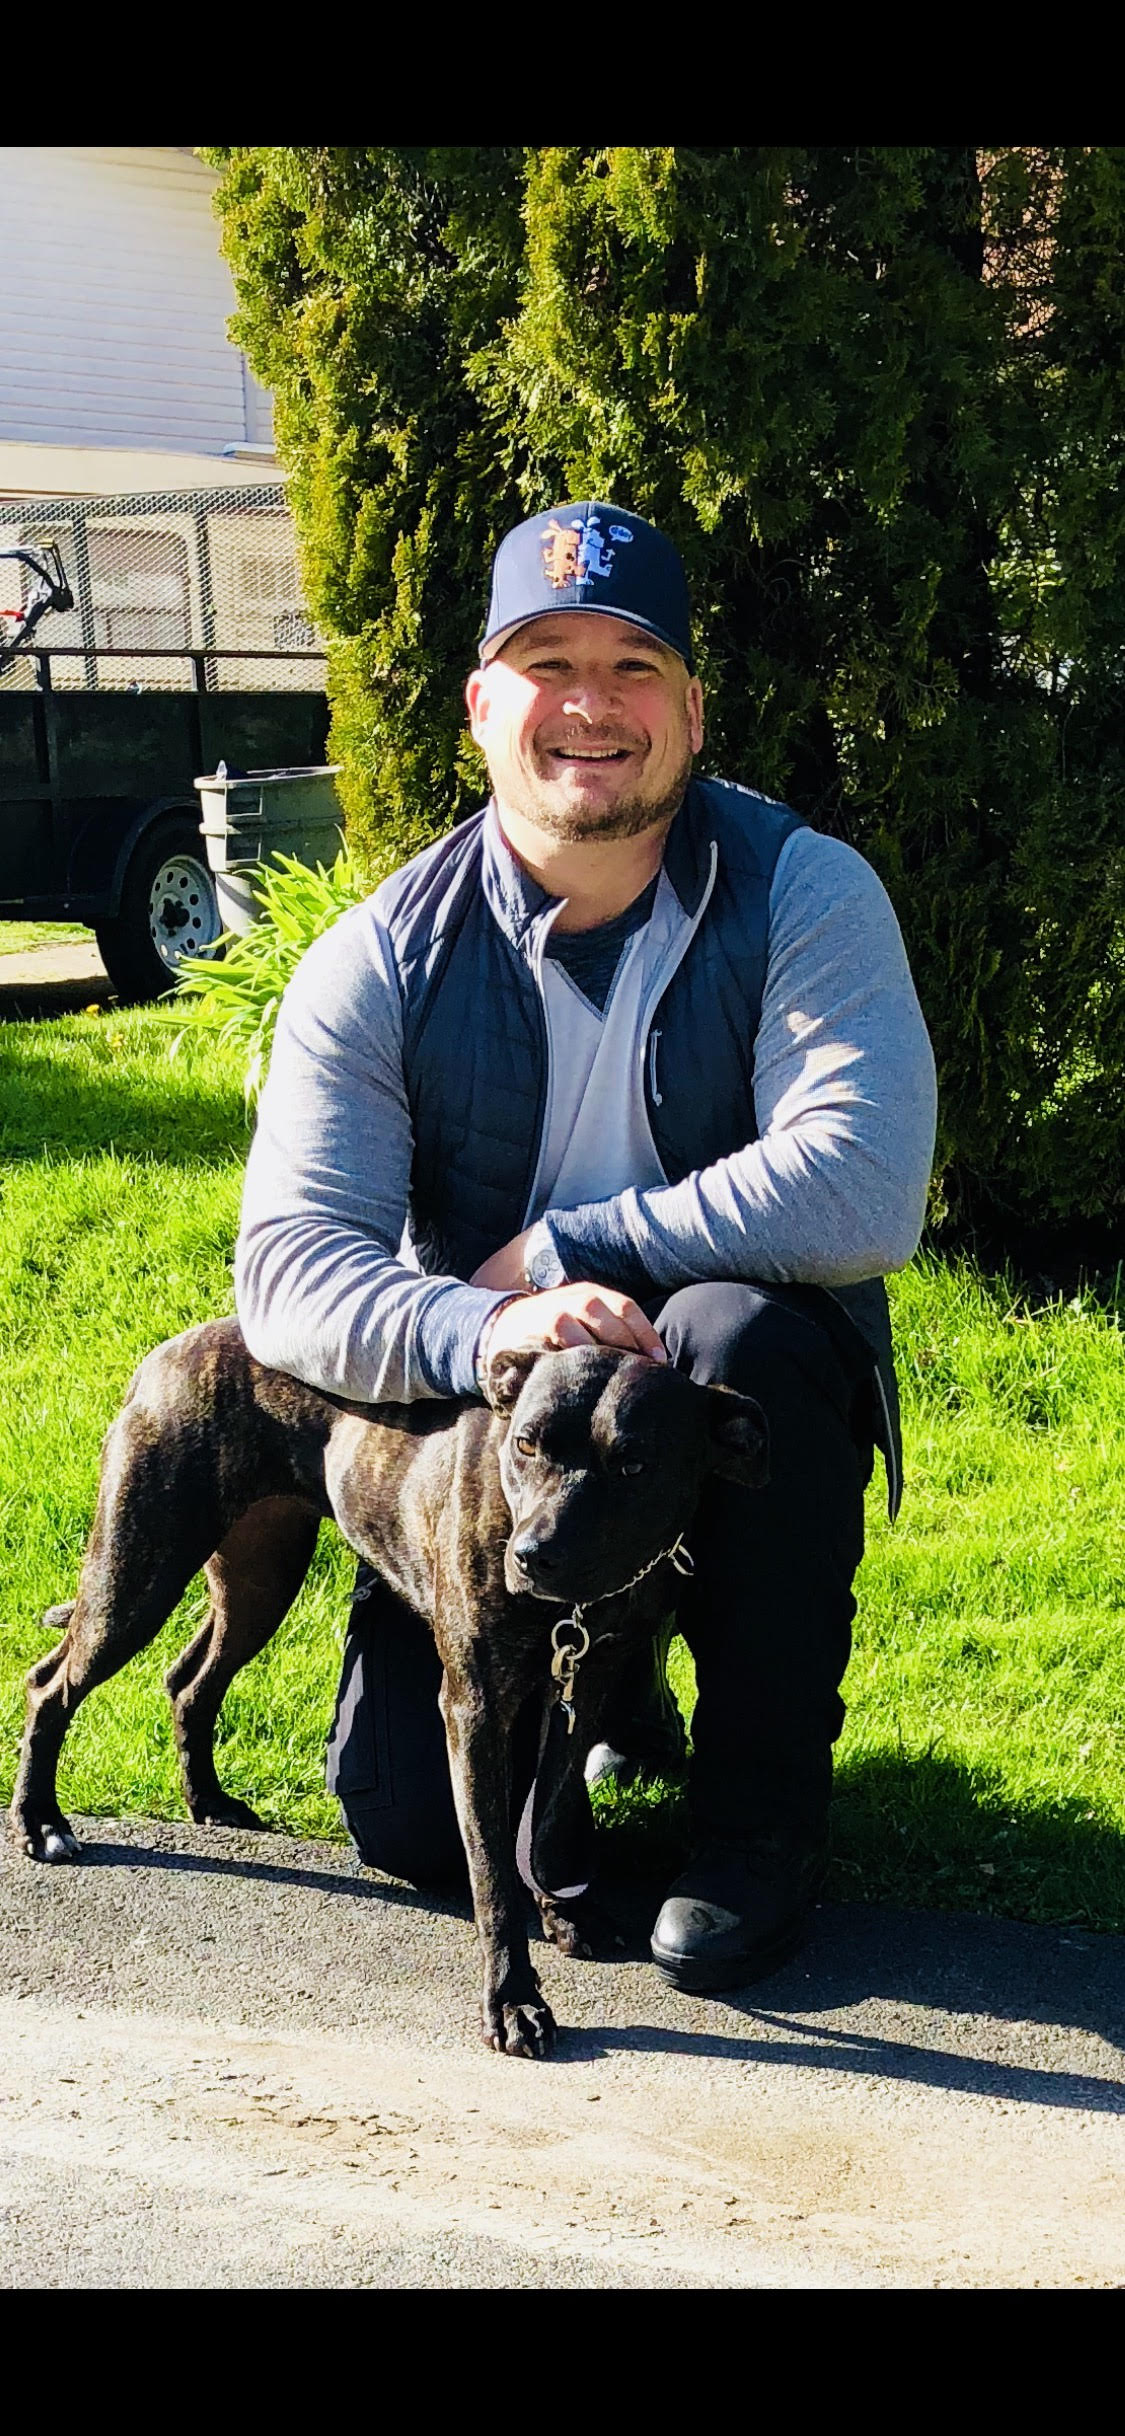 #bestdogtrainingmelbourne, #dogsofbarkbusters, #bestdogtrainers